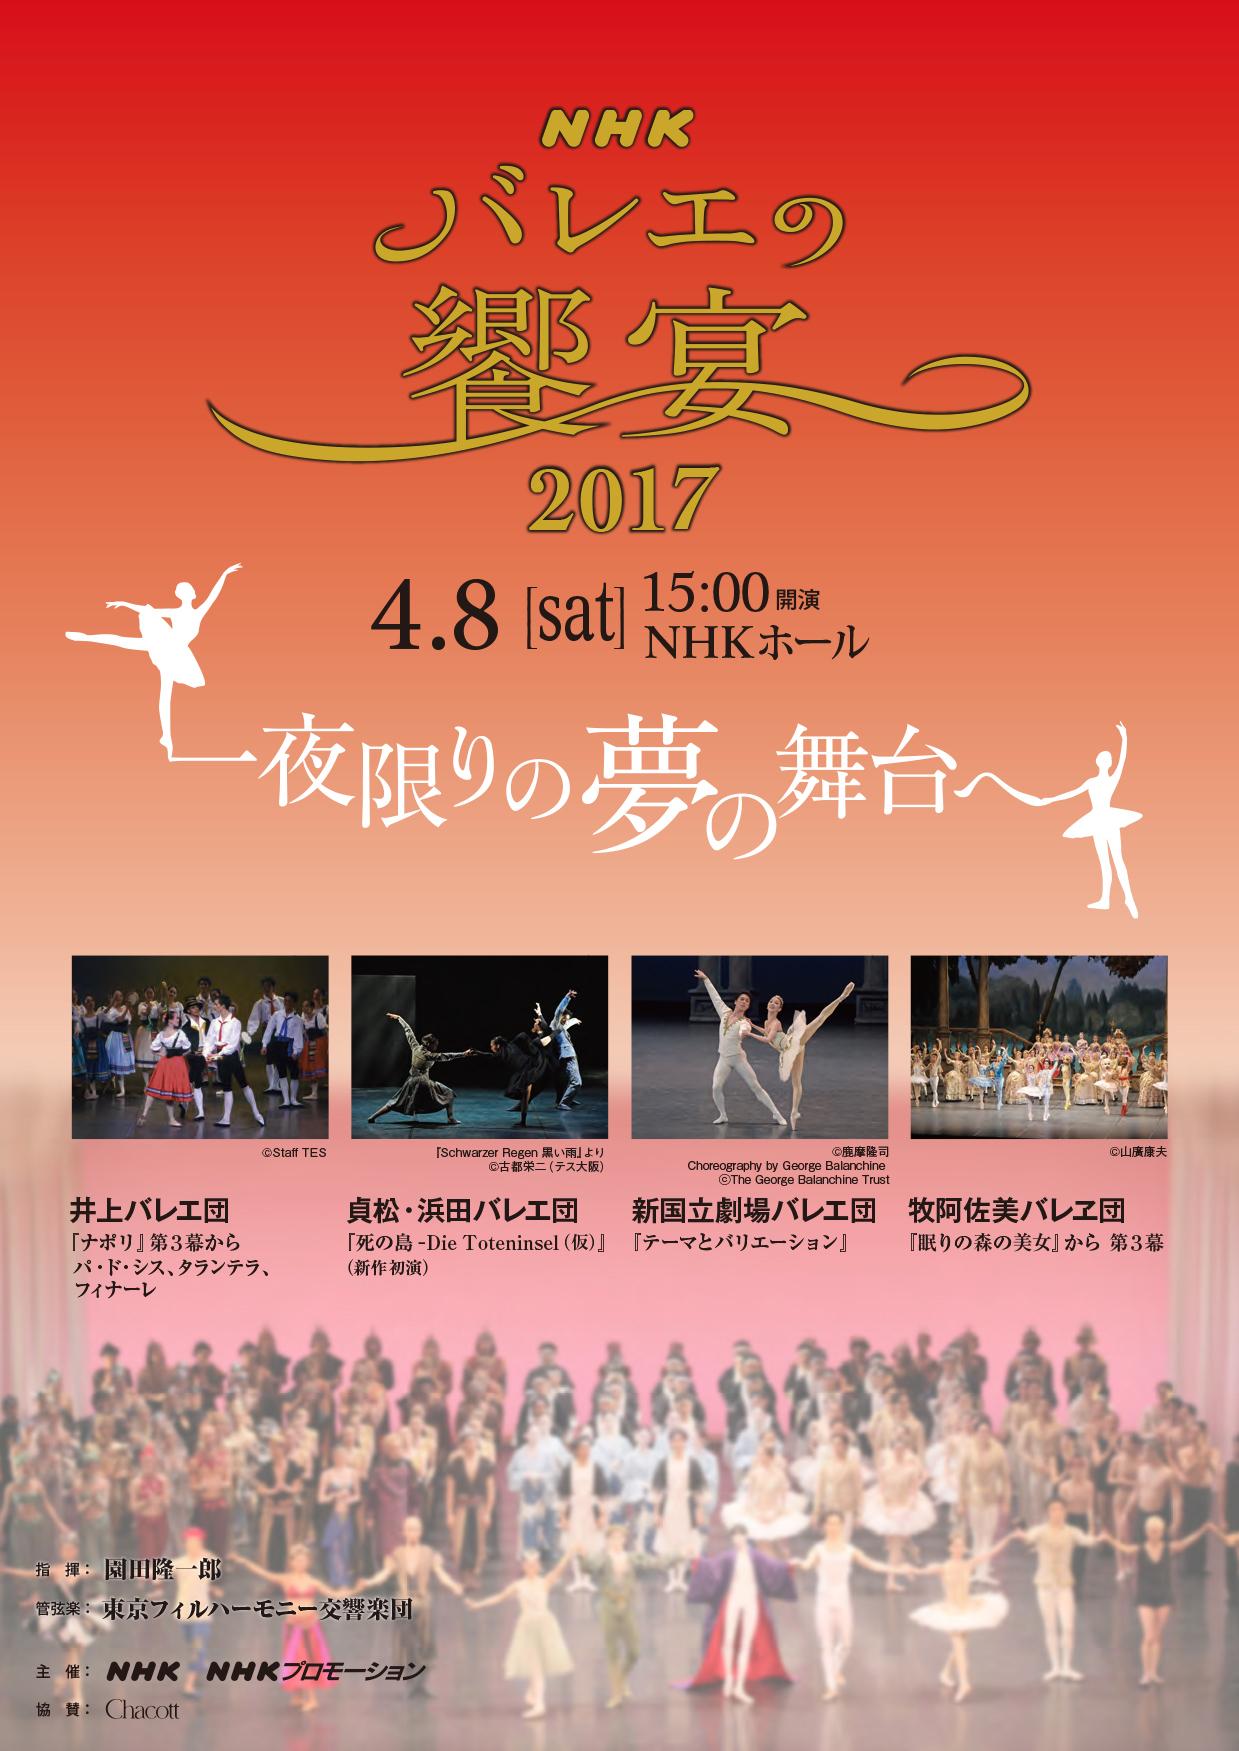 『NHKバレエの饗宴』